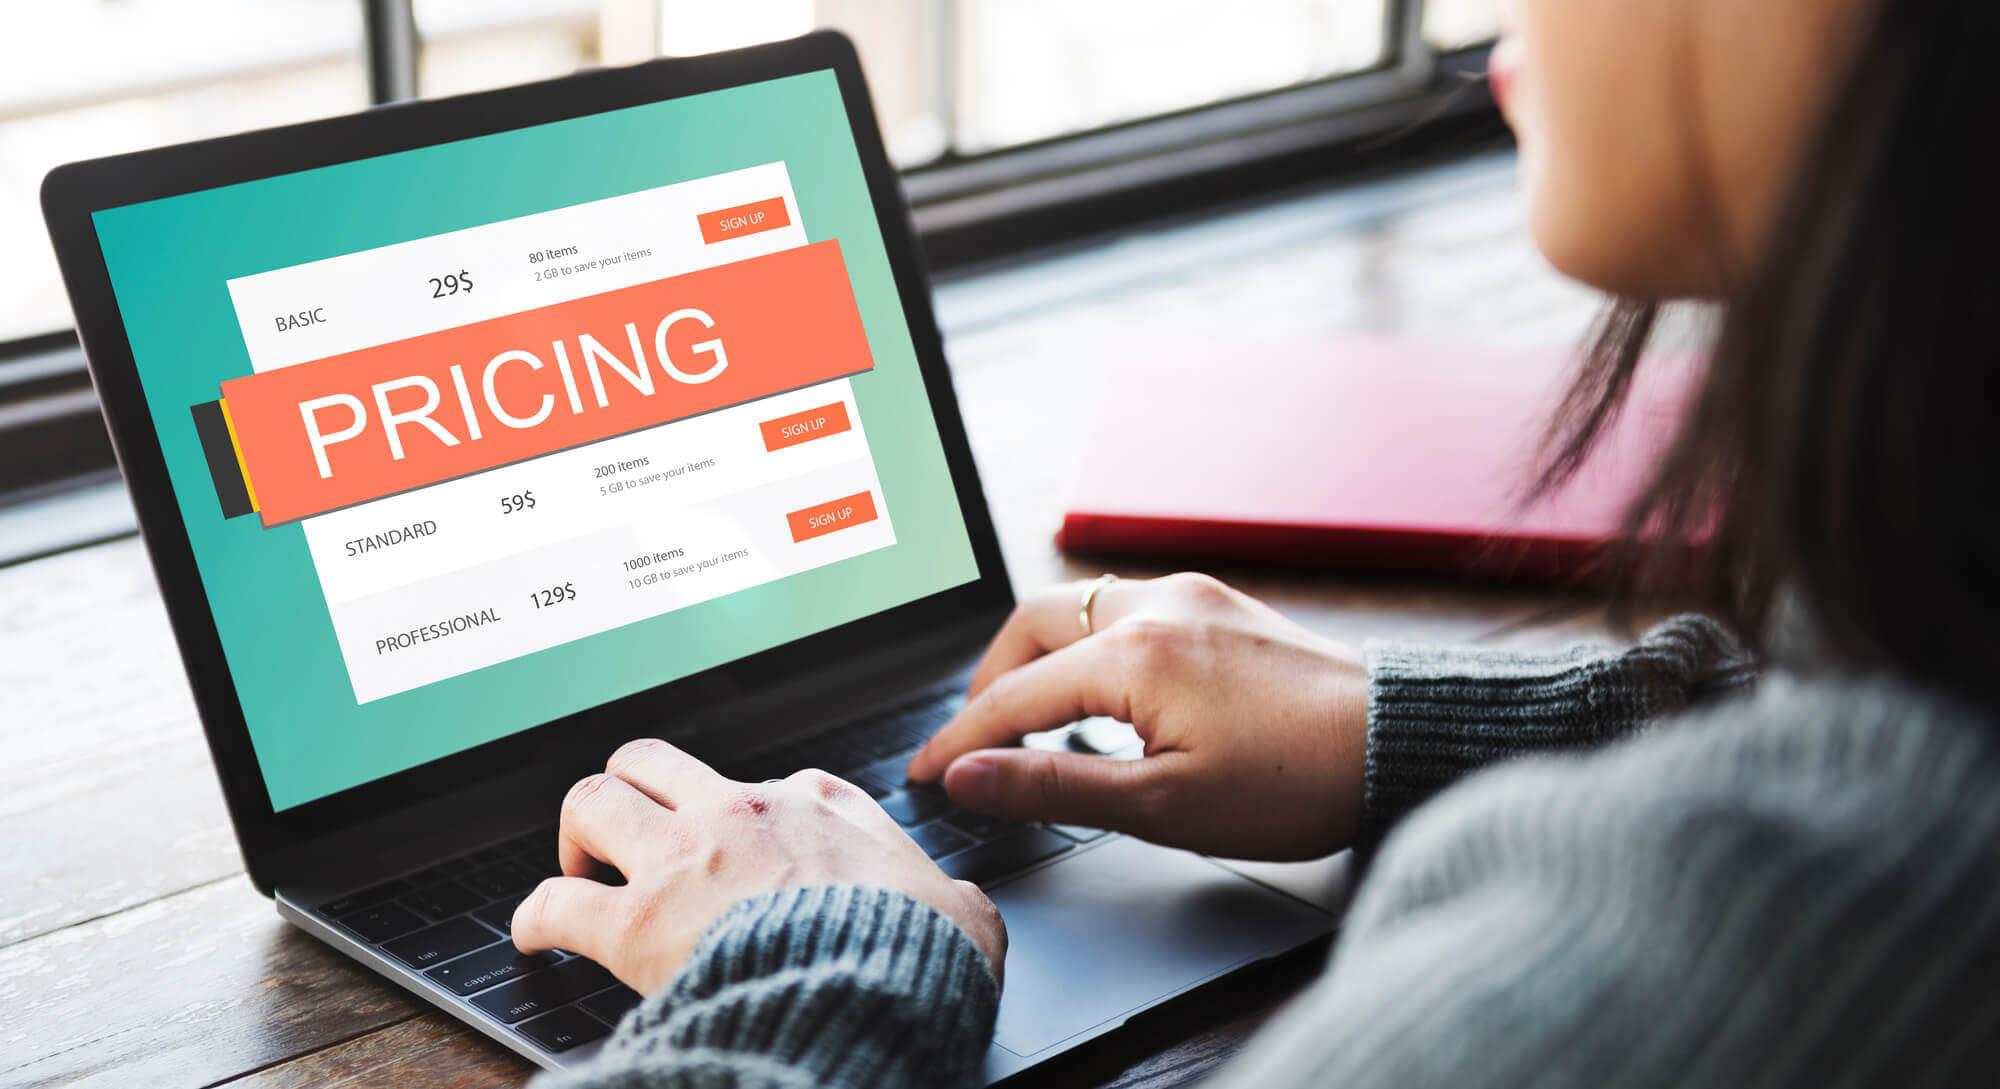 webinar pricing